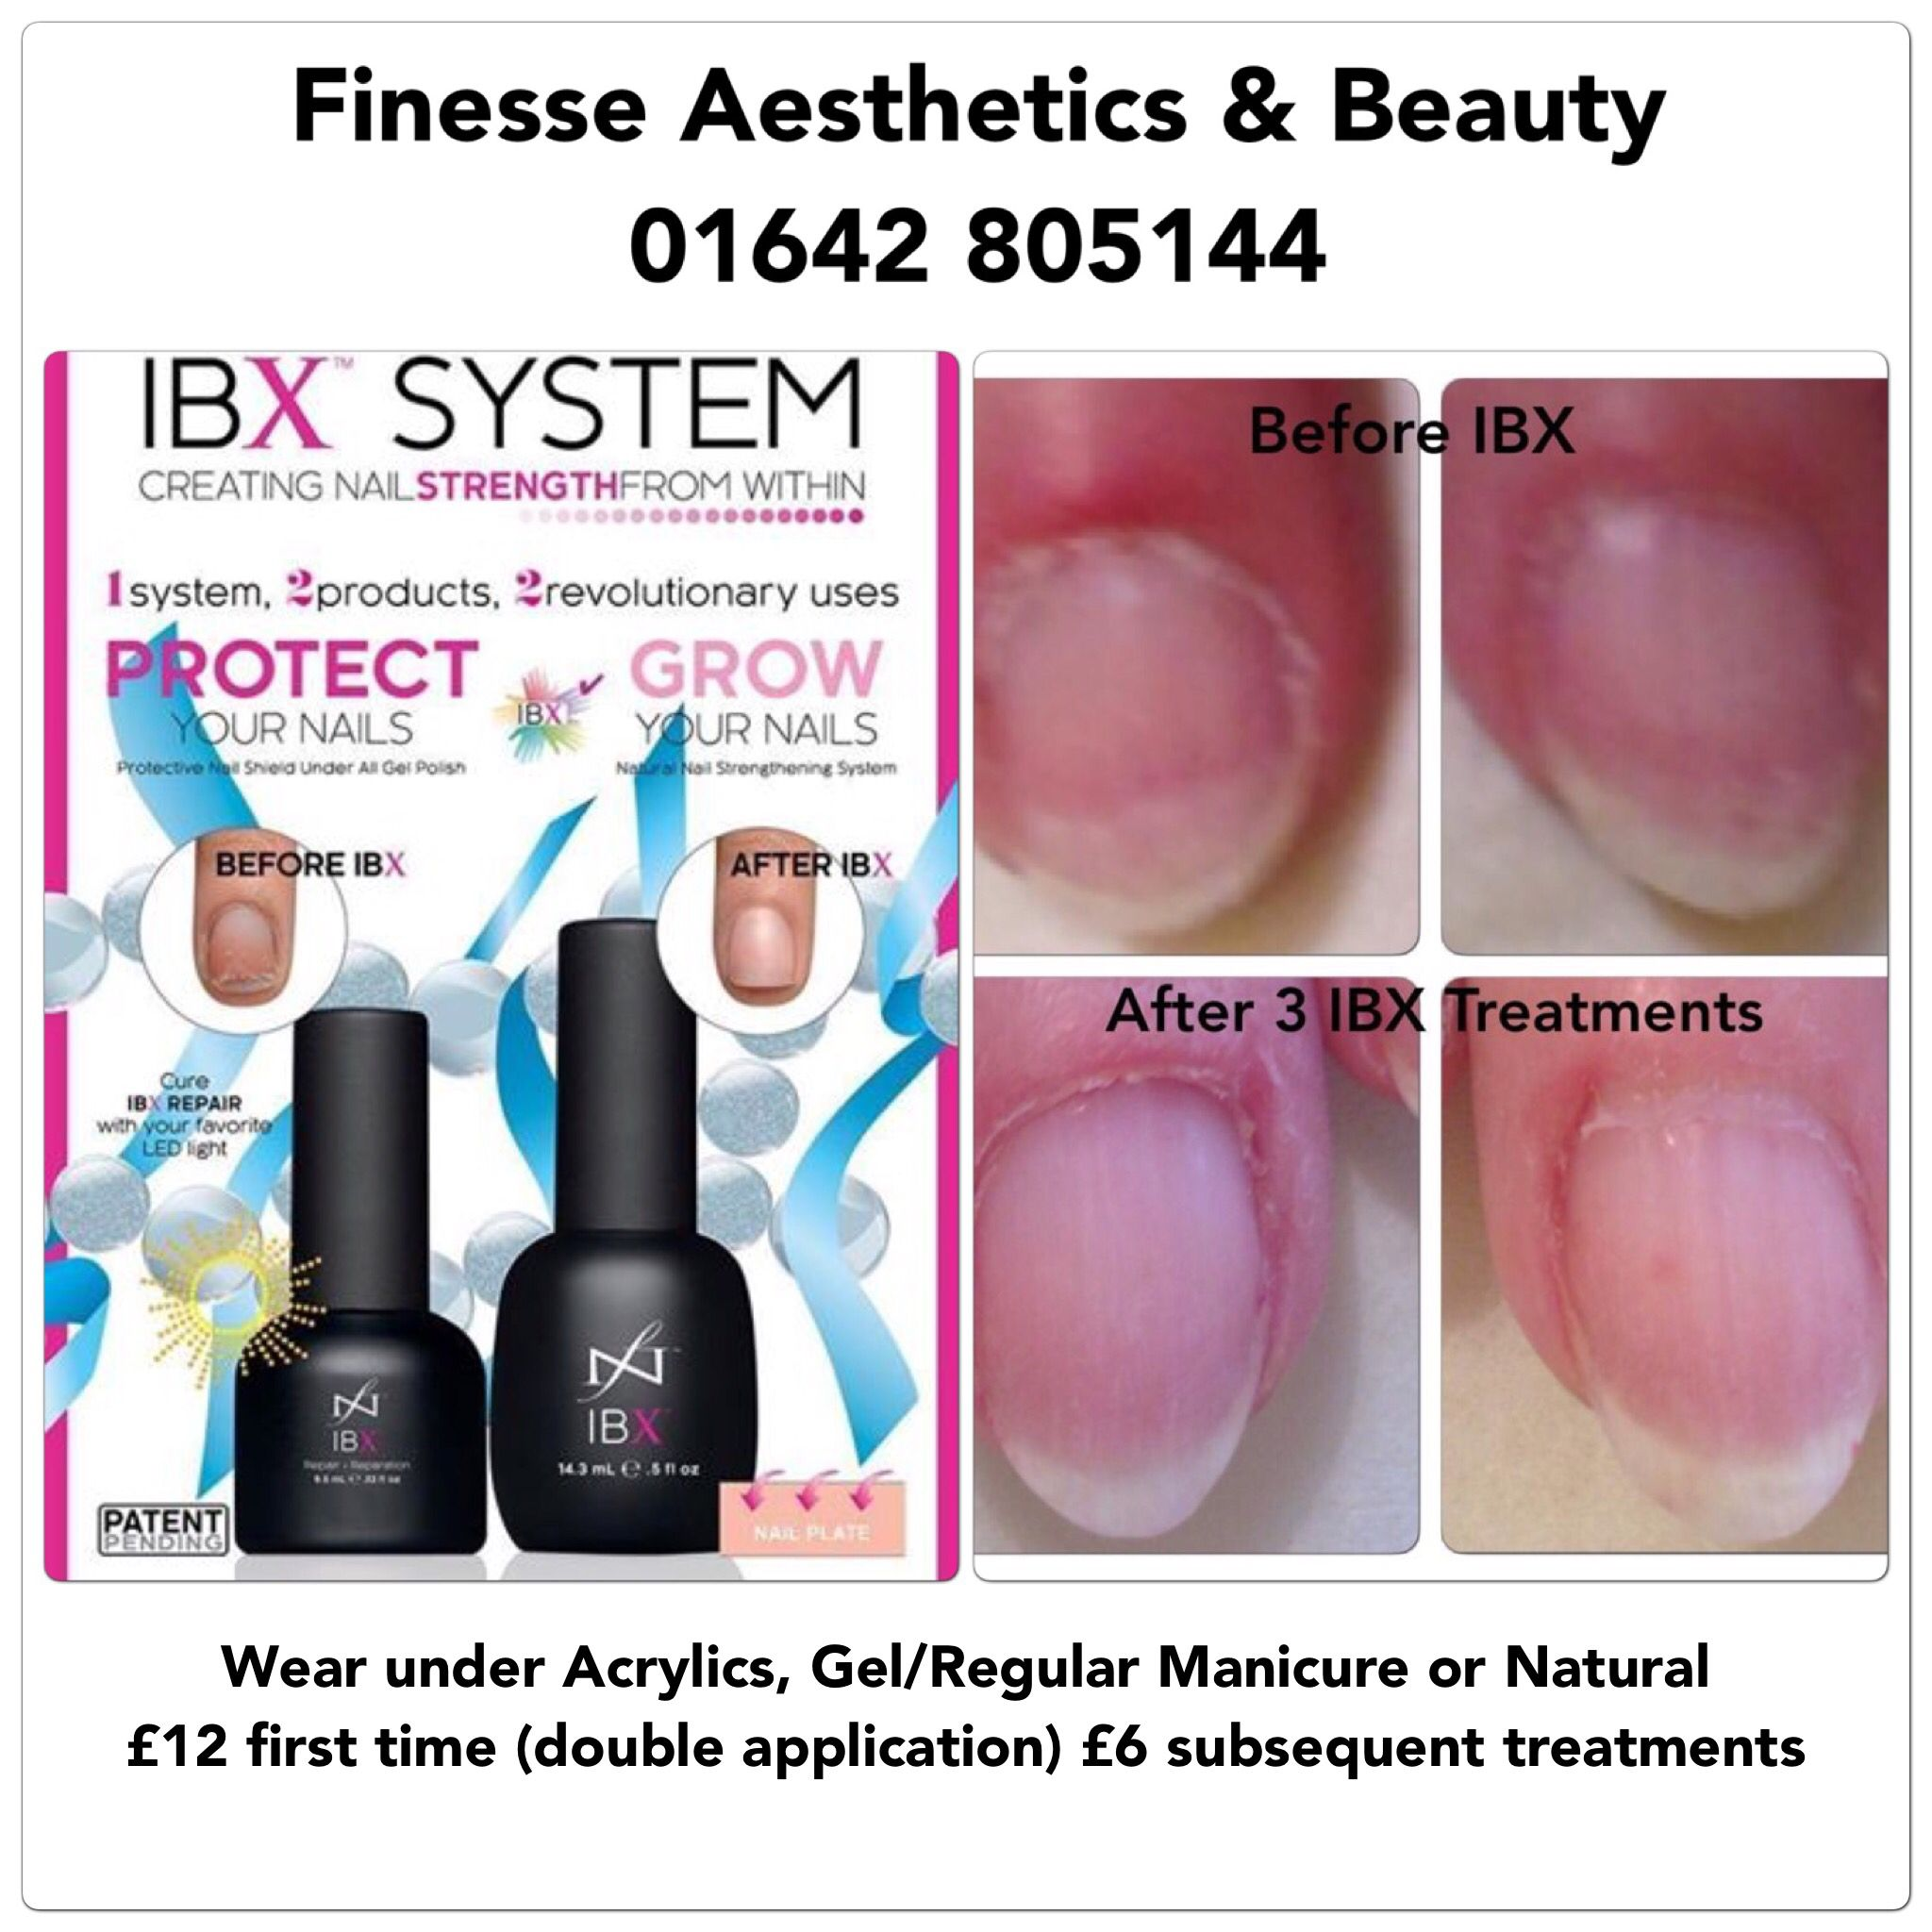 IBX Intensive Nail Repair treats nails that are weak, thin, ridged ...